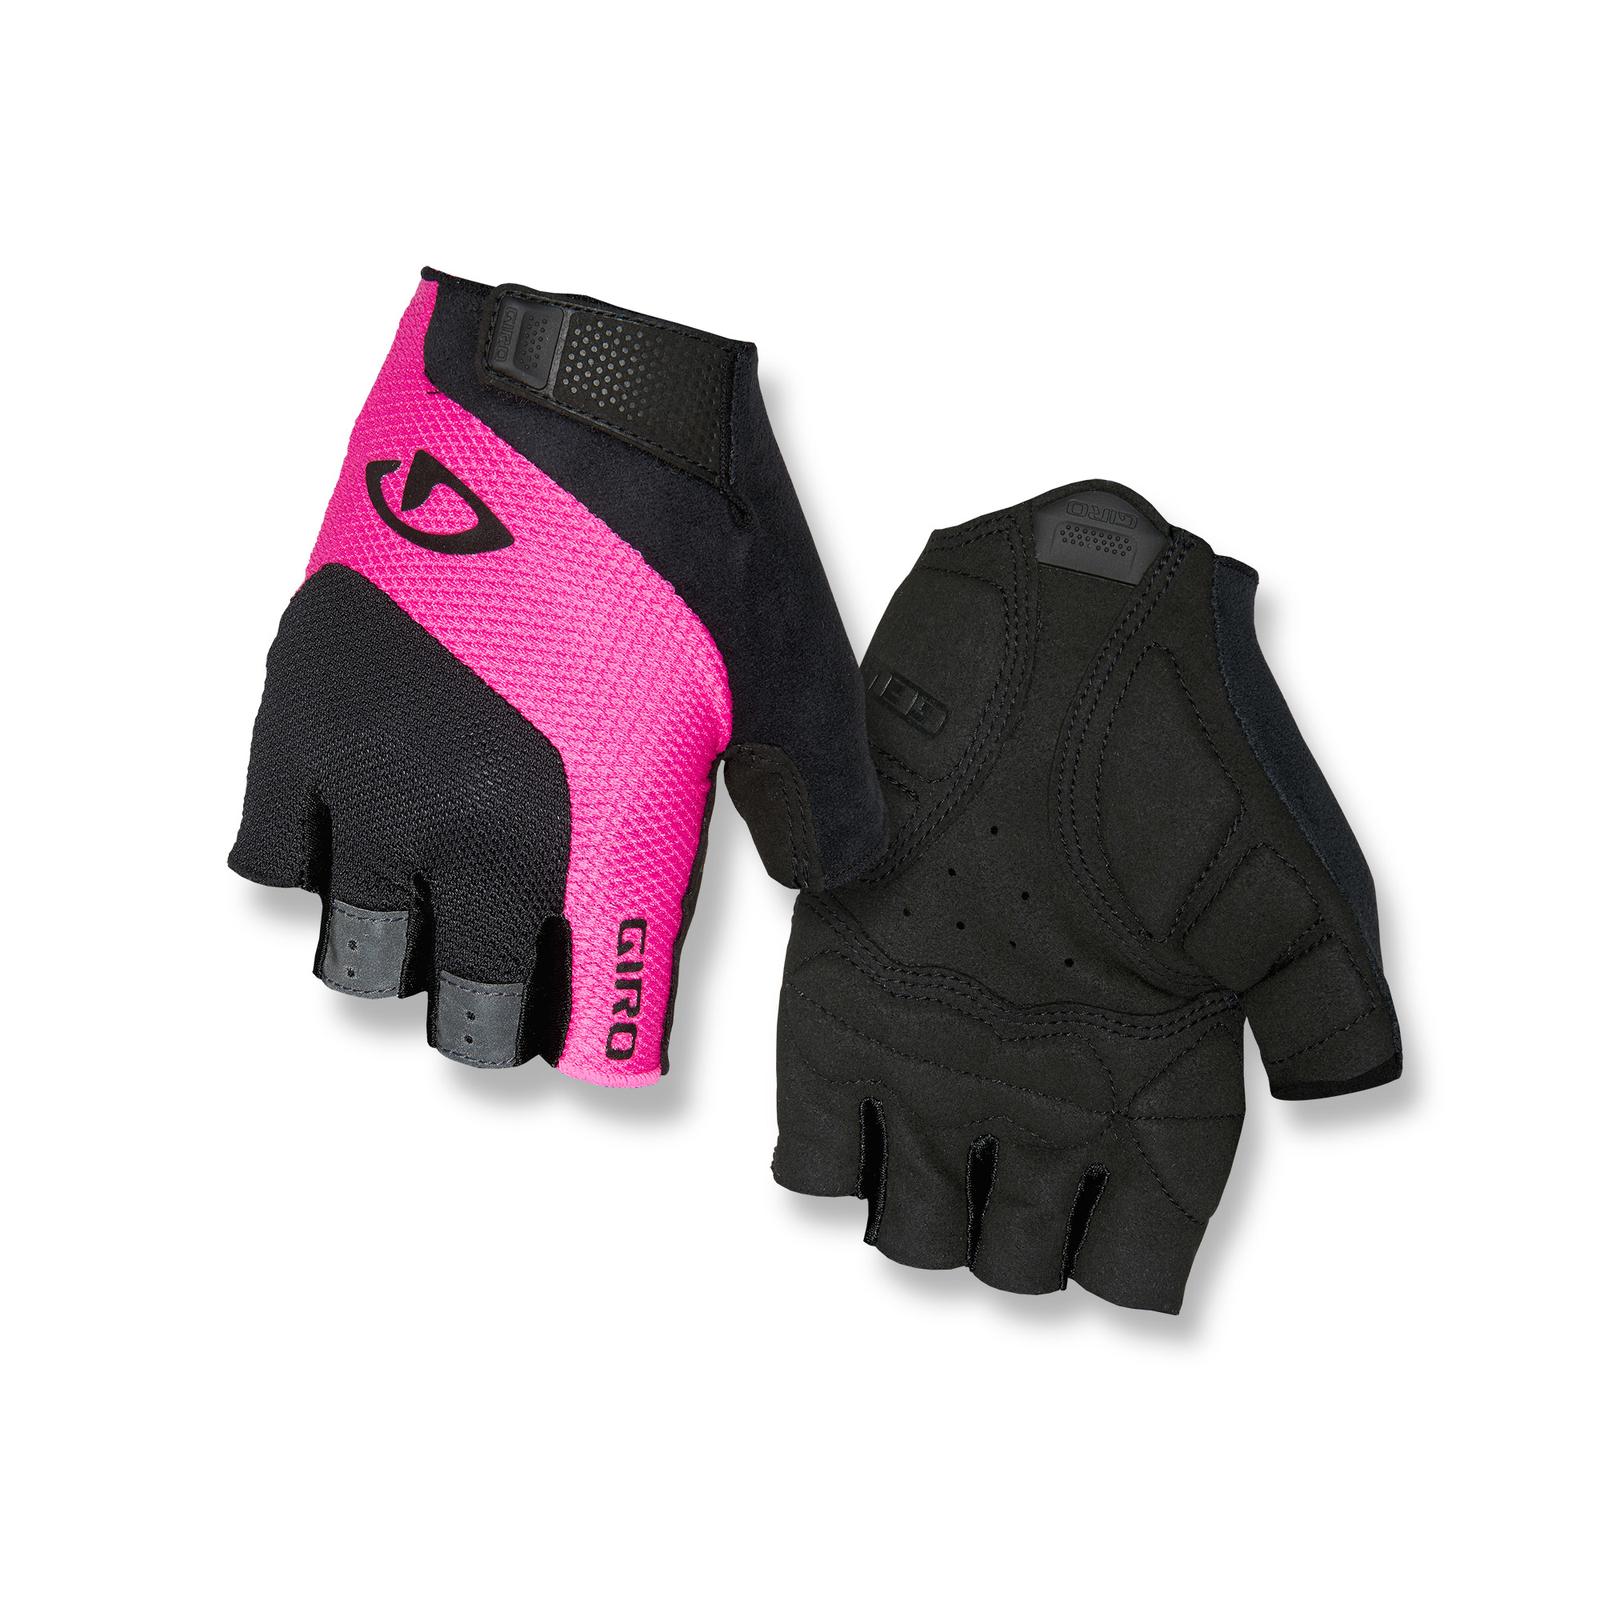 giro tessa damen fahrrad handschuhe kurz schwarz pink 2019. Black Bedroom Furniture Sets. Home Design Ideas